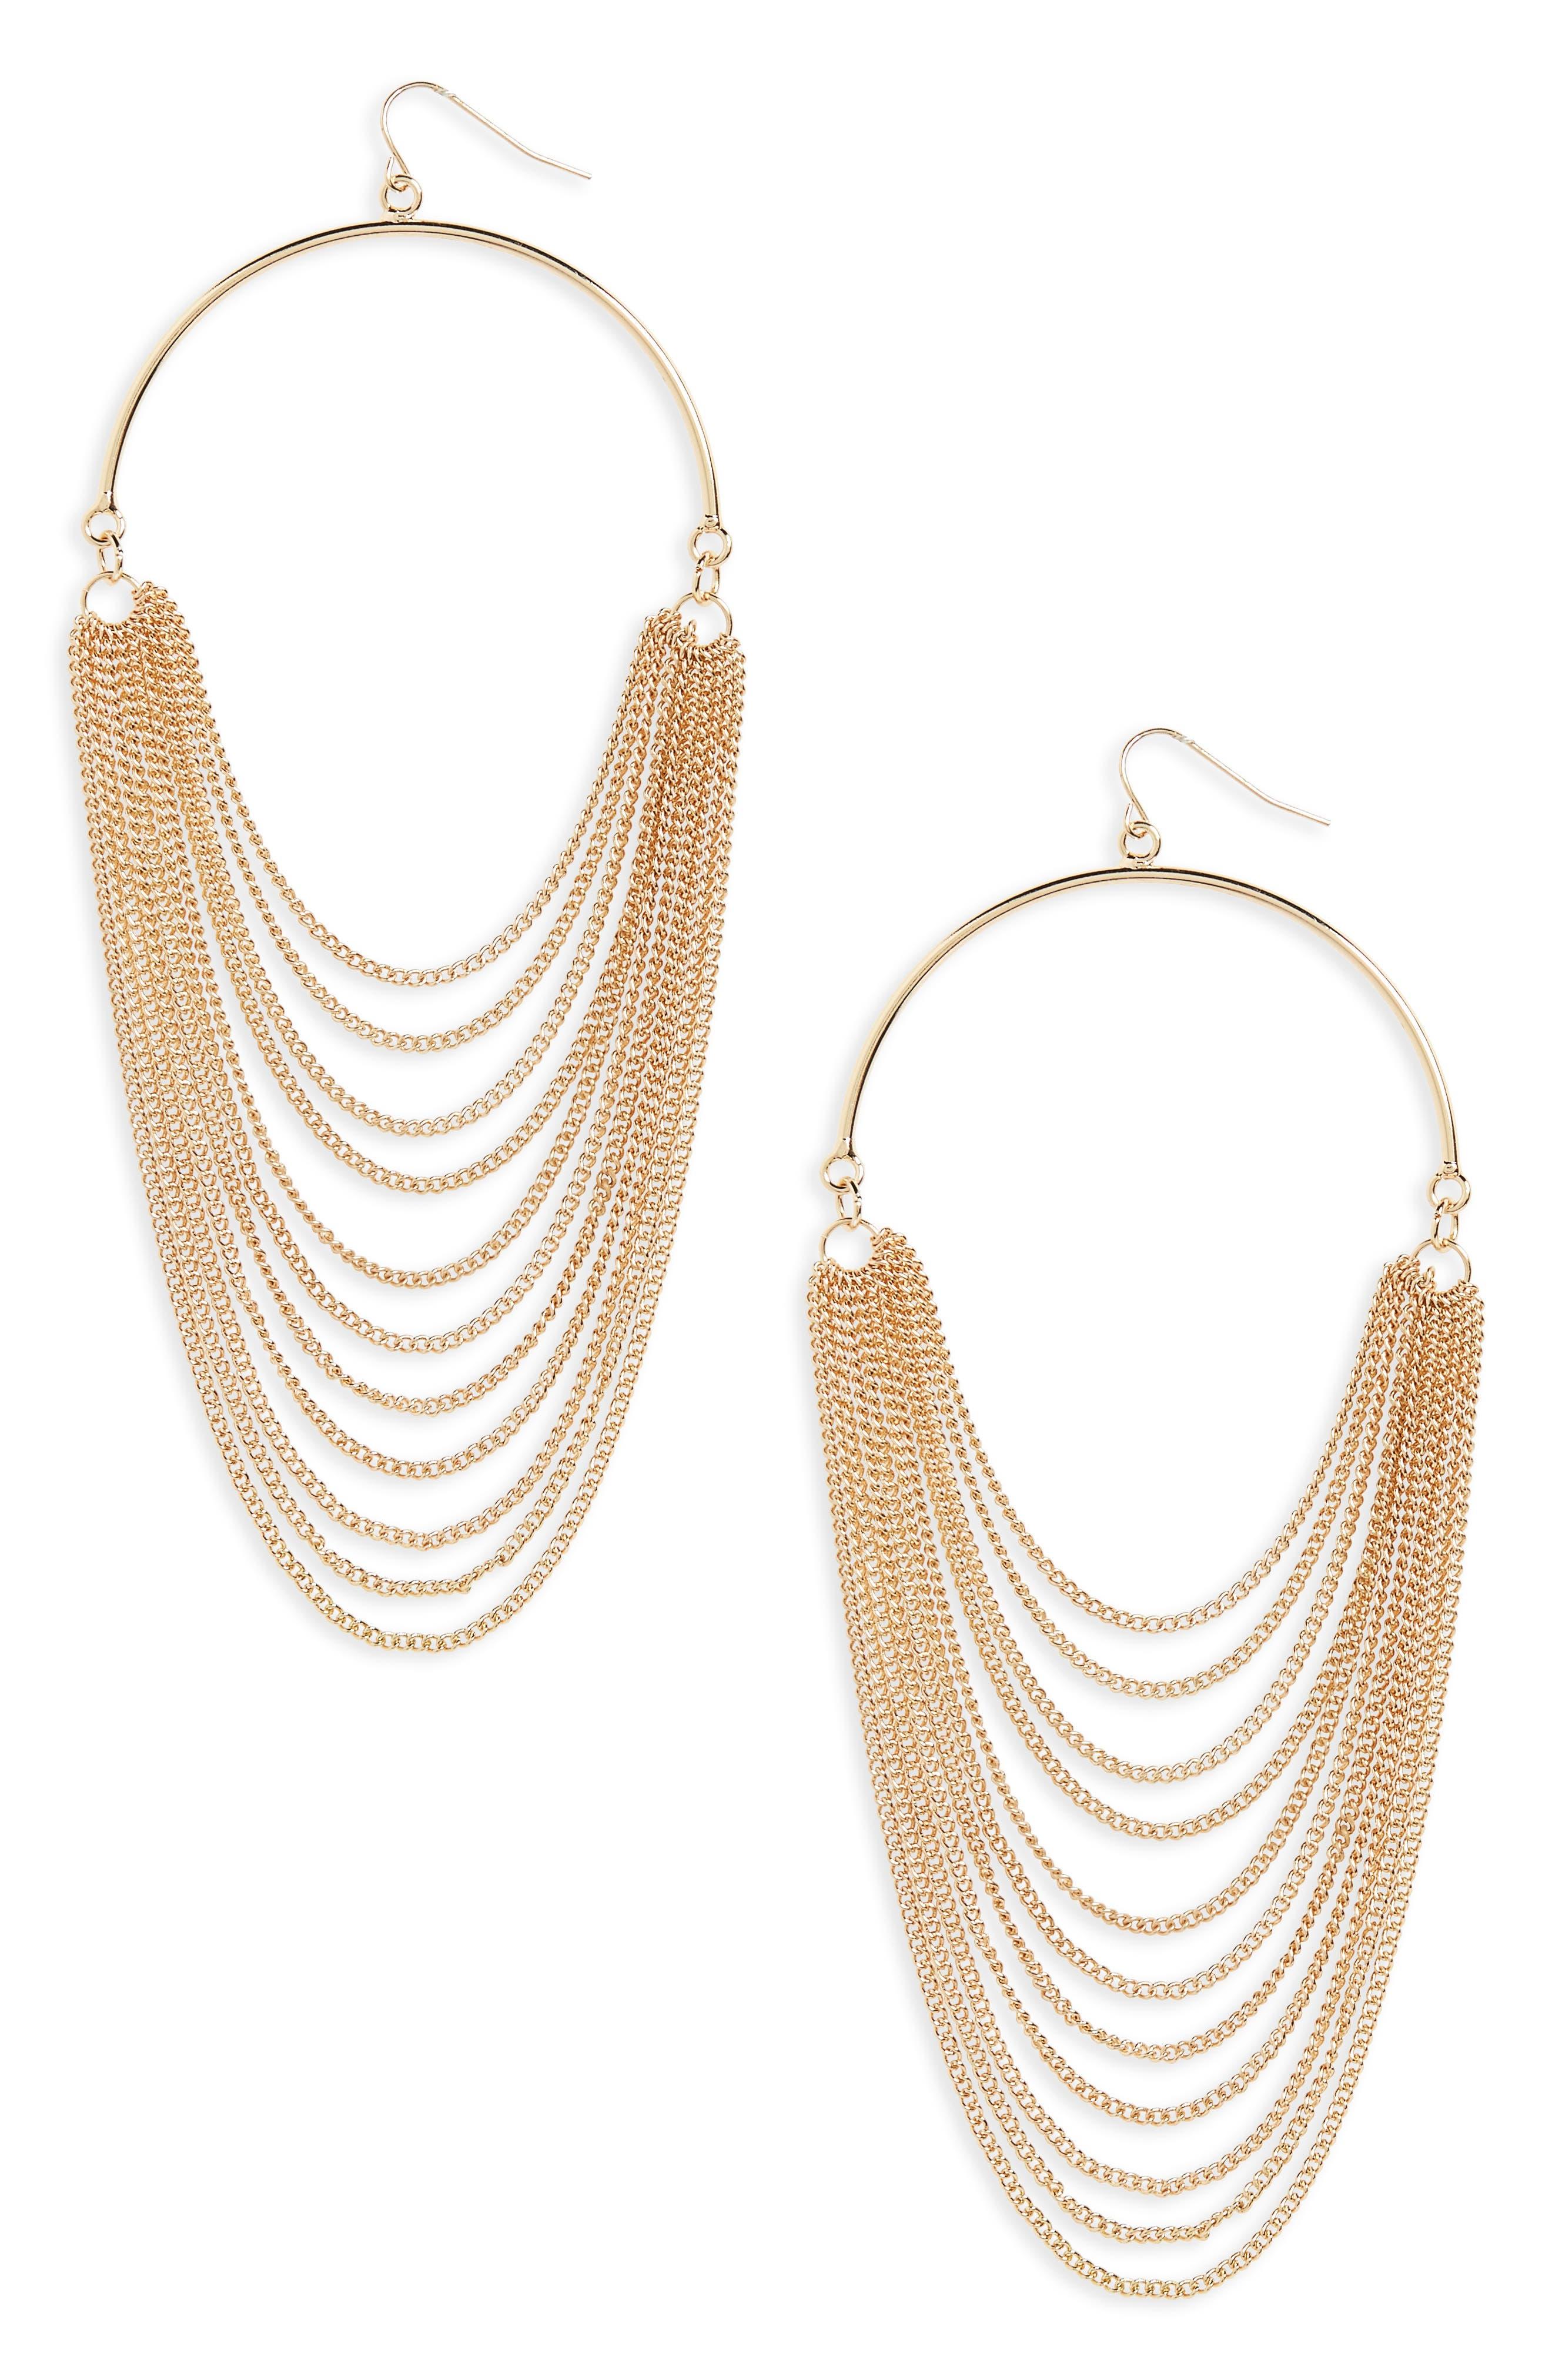 Natasha Layered Chain Hoop Earrings